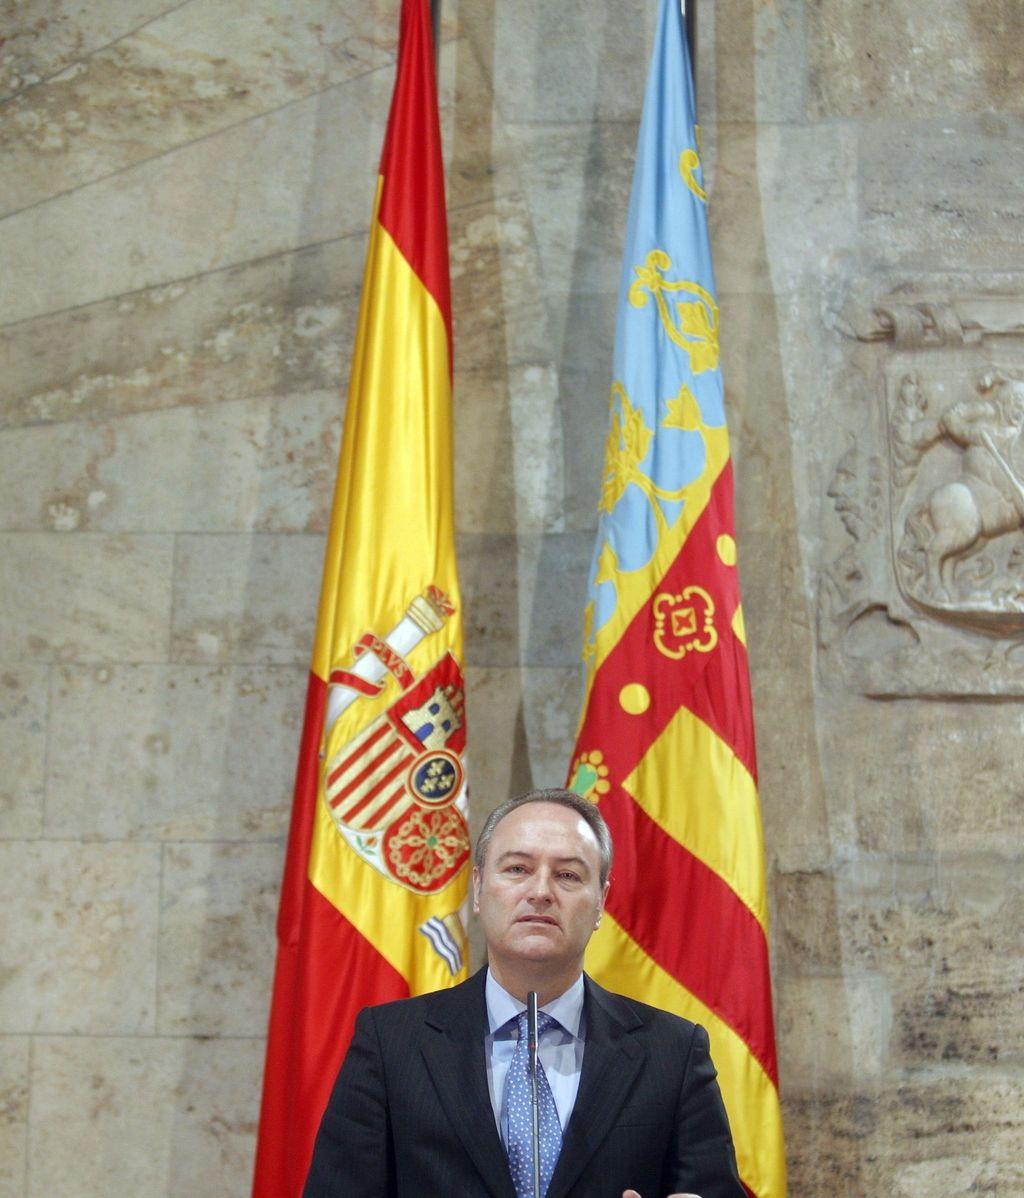 El president de la Generalitat, Alberto Fabra